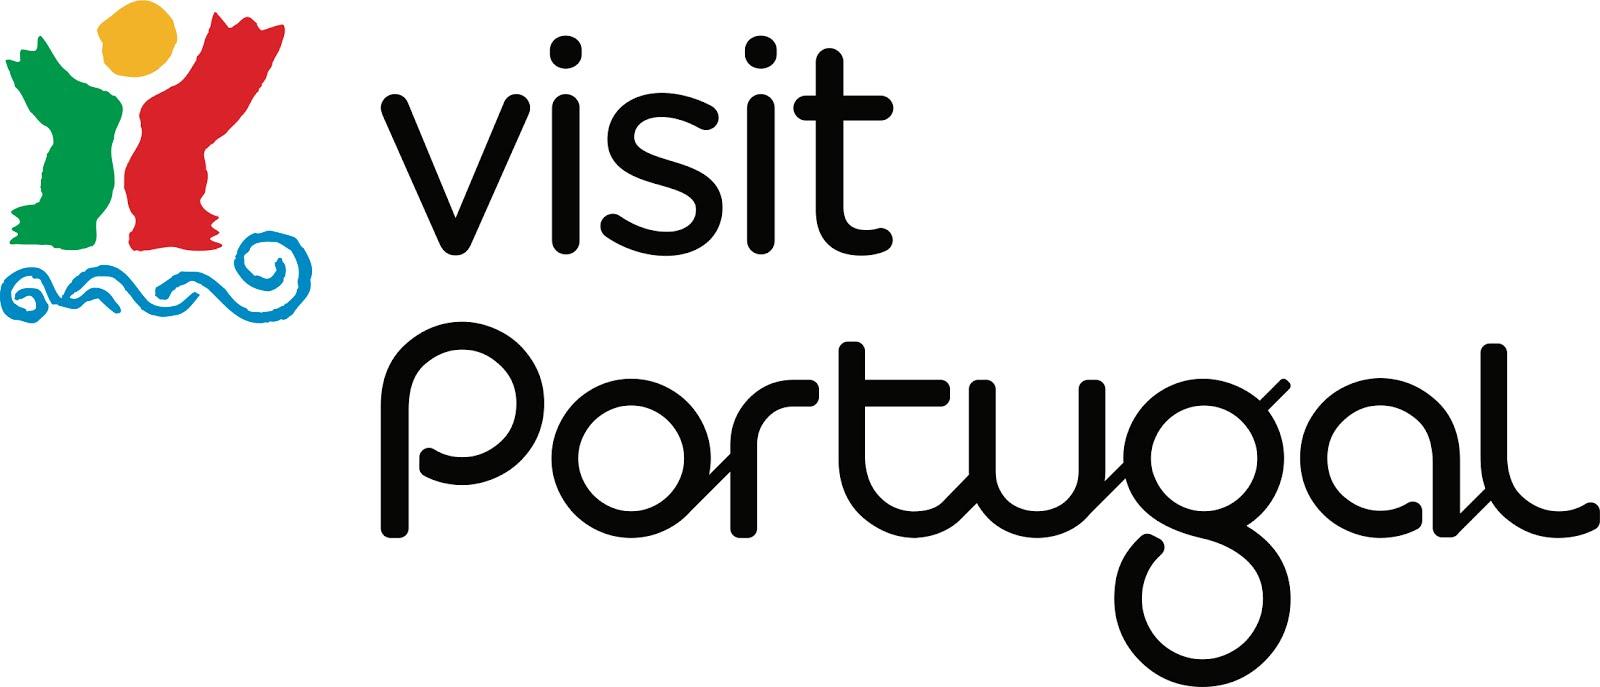 Official Portuguese tourism agency